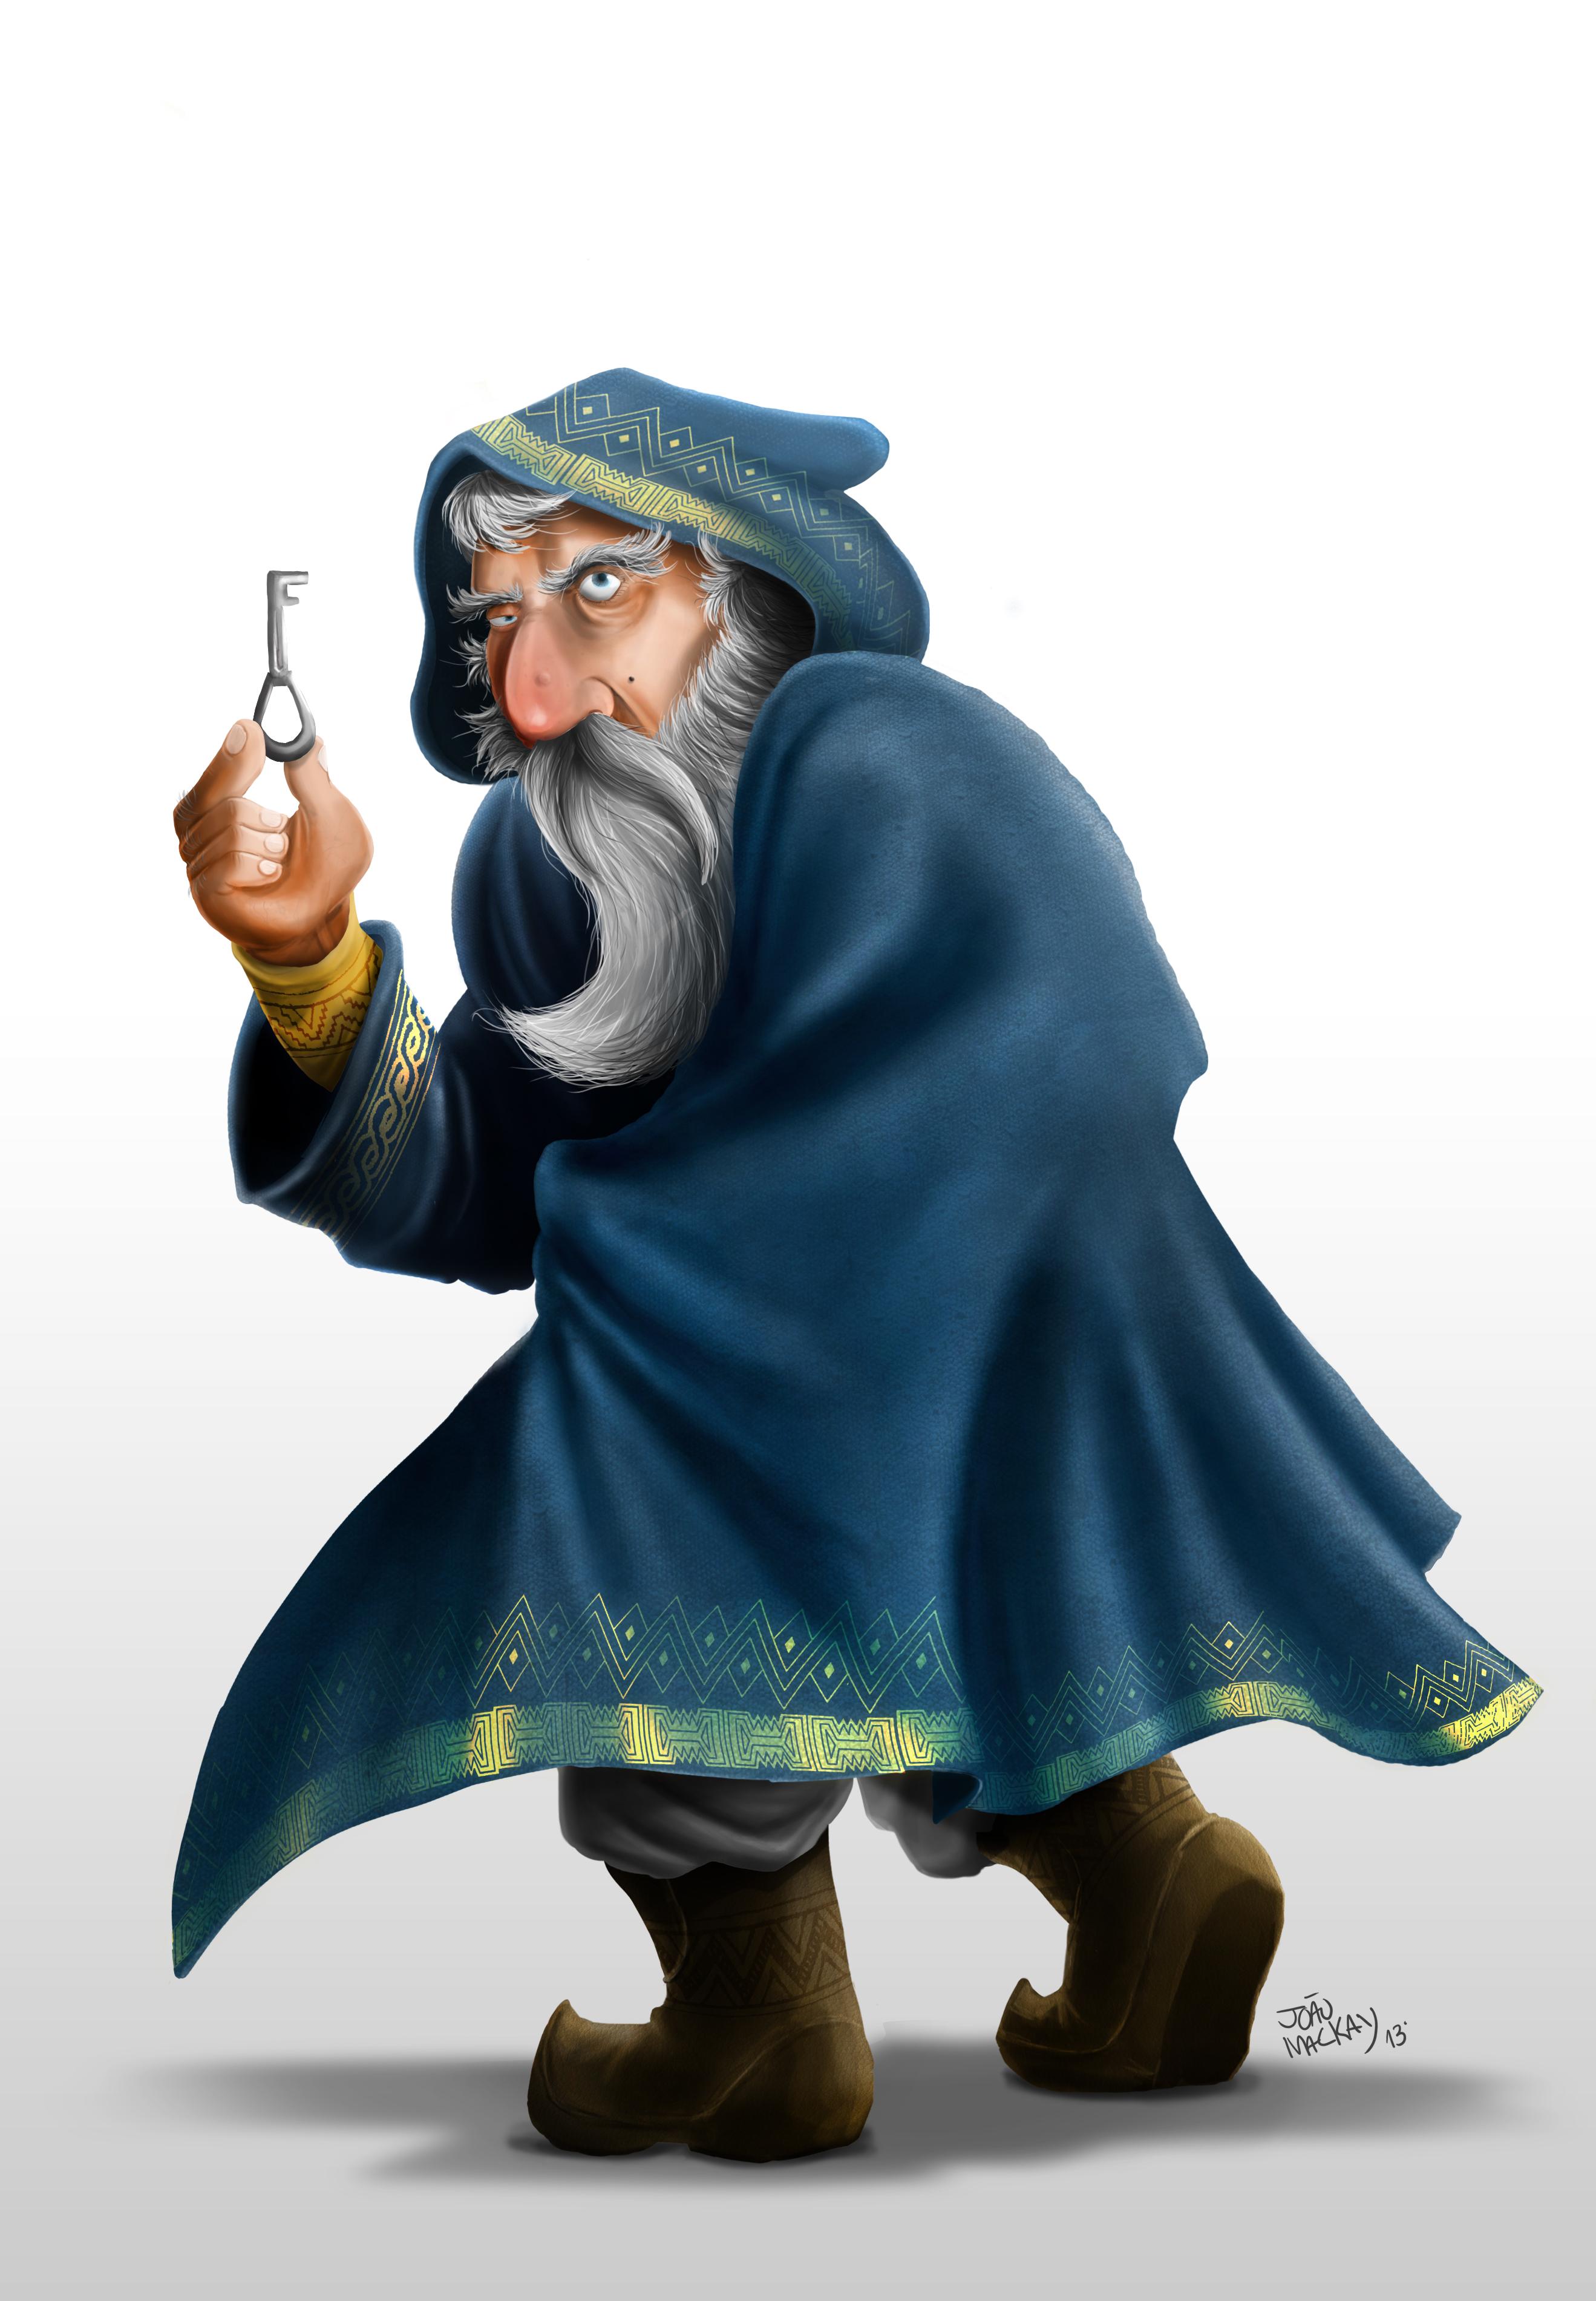 Thorin Oakenshield - The Hobbit by joaoMachay